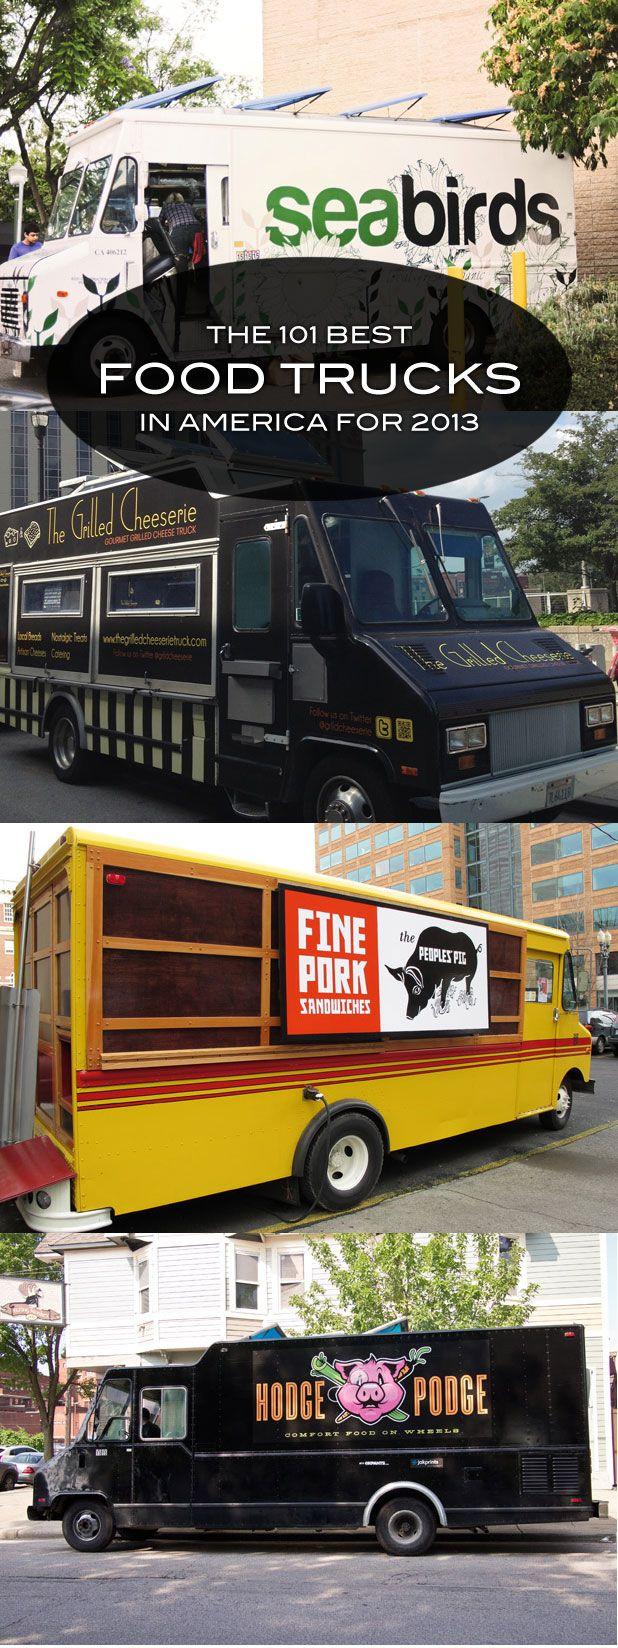 101 best food trucks in america for 2013 food trucks. Black Bedroom Furniture Sets. Home Design Ideas